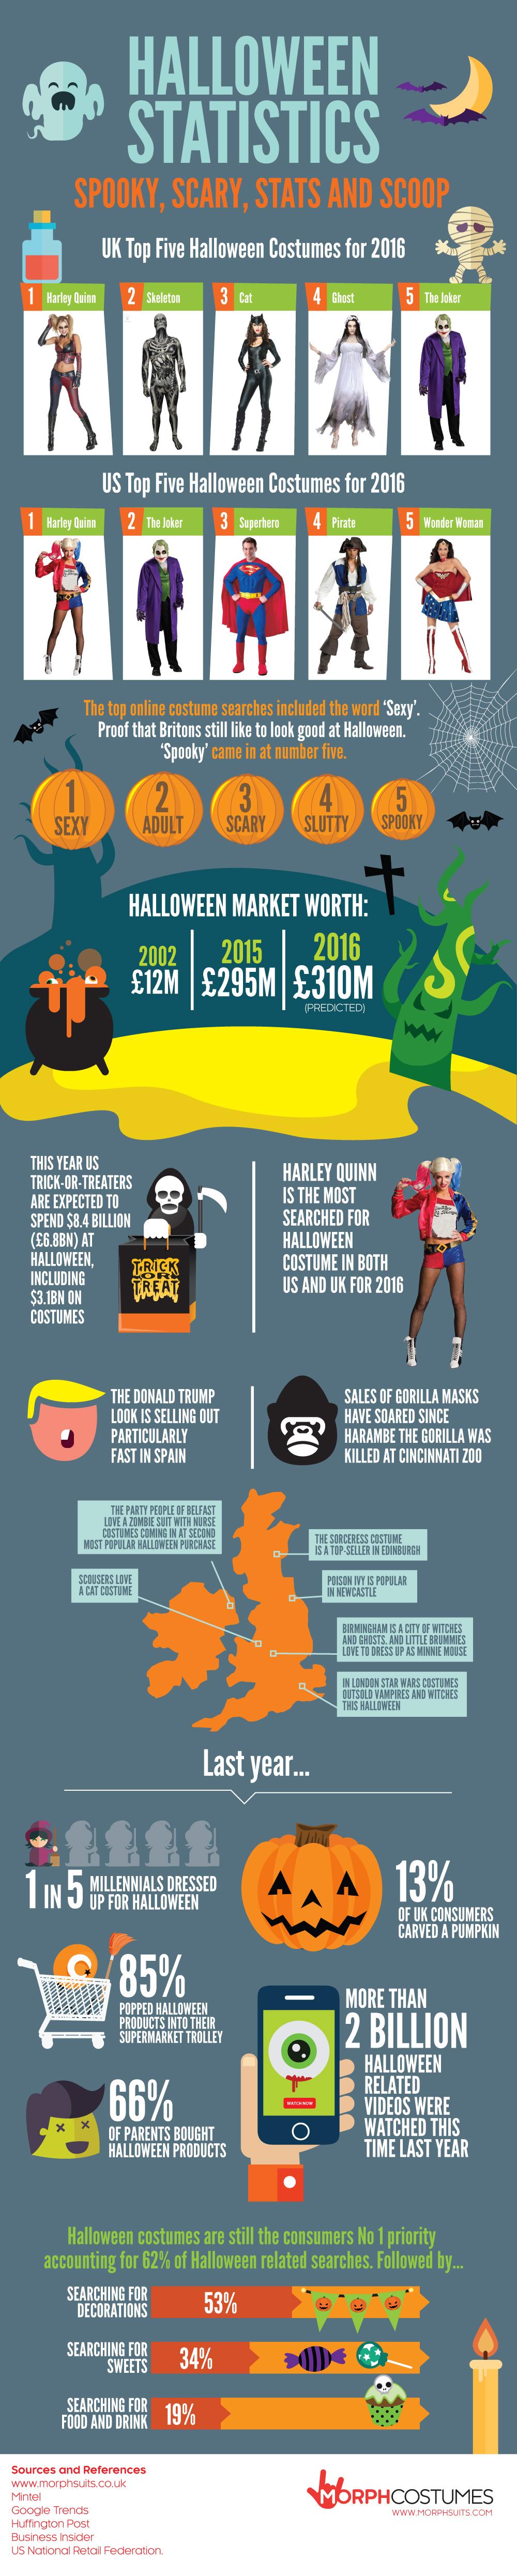 Halloween Stats 2016